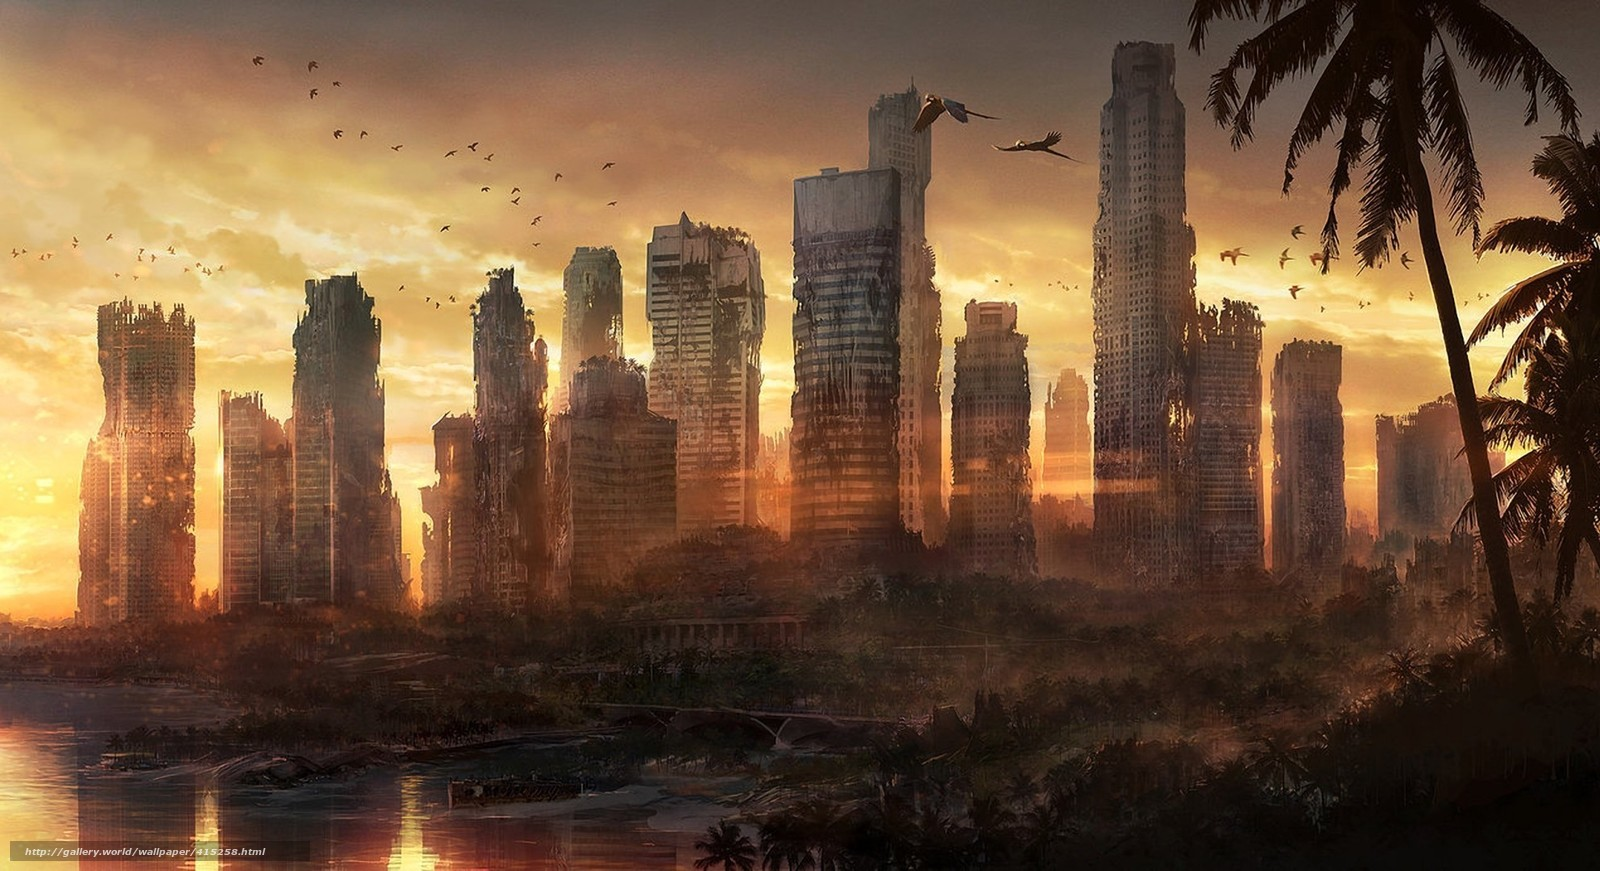 [Mission JL] Damage Control [Flash, Superman, Shazam] 415258_art_singapore_singapur_ruiny_postapokaliptika_goro_1985x1080_www.Gde-Fon.com